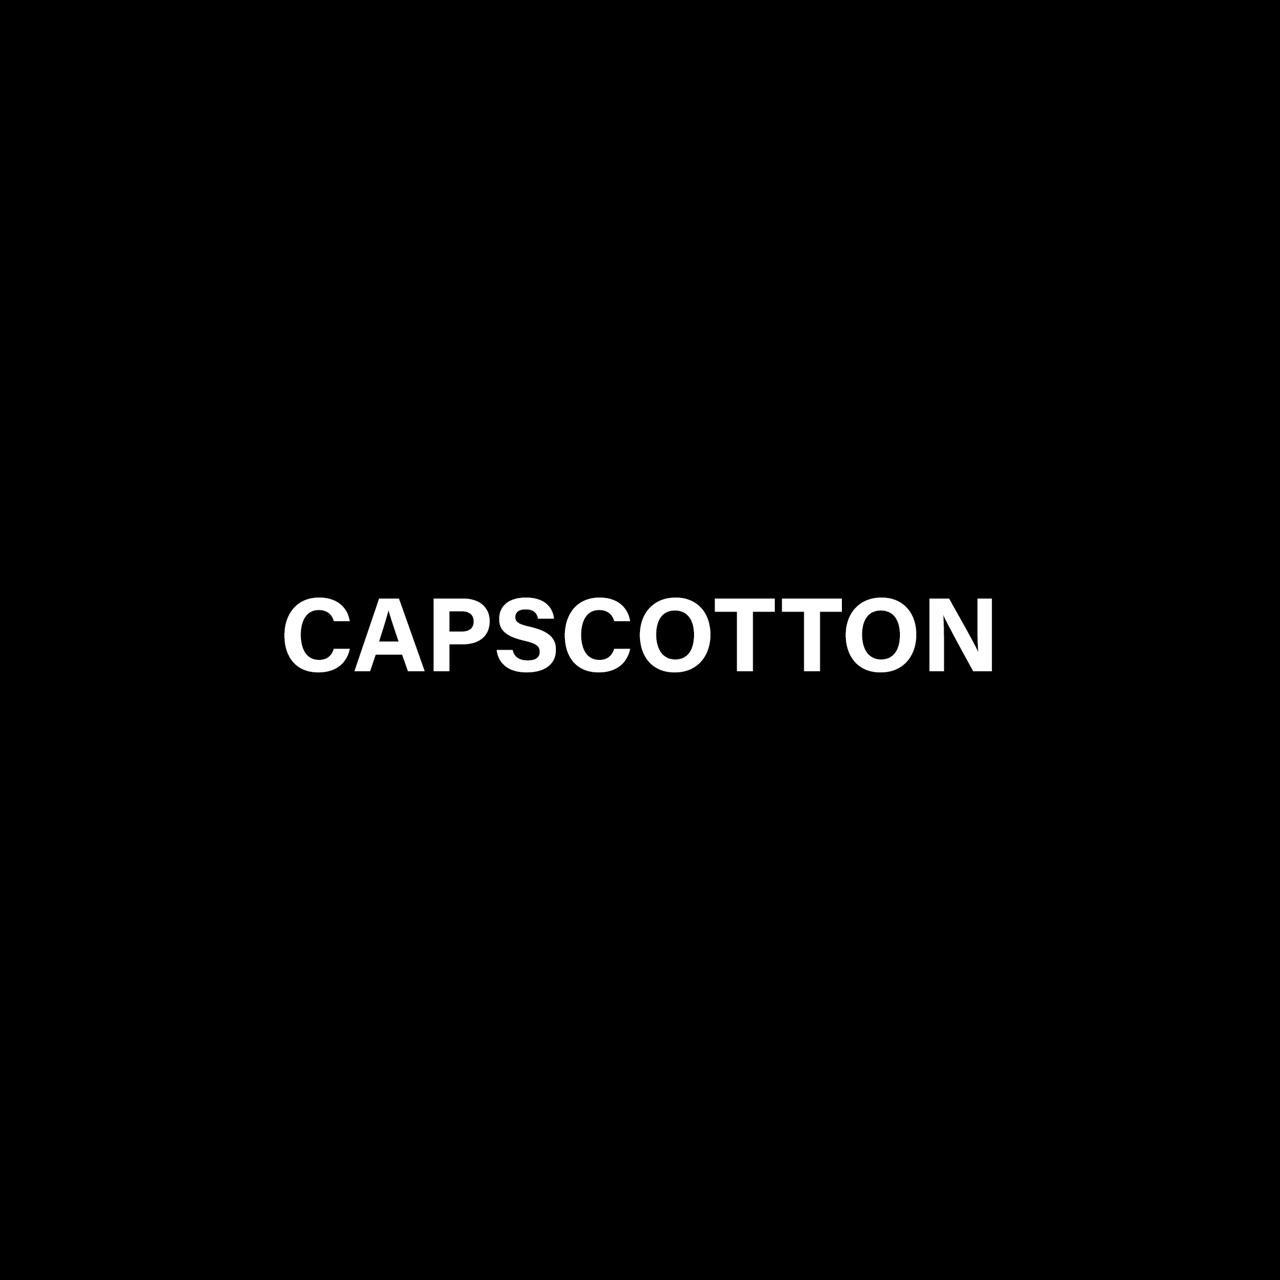 Capscotton